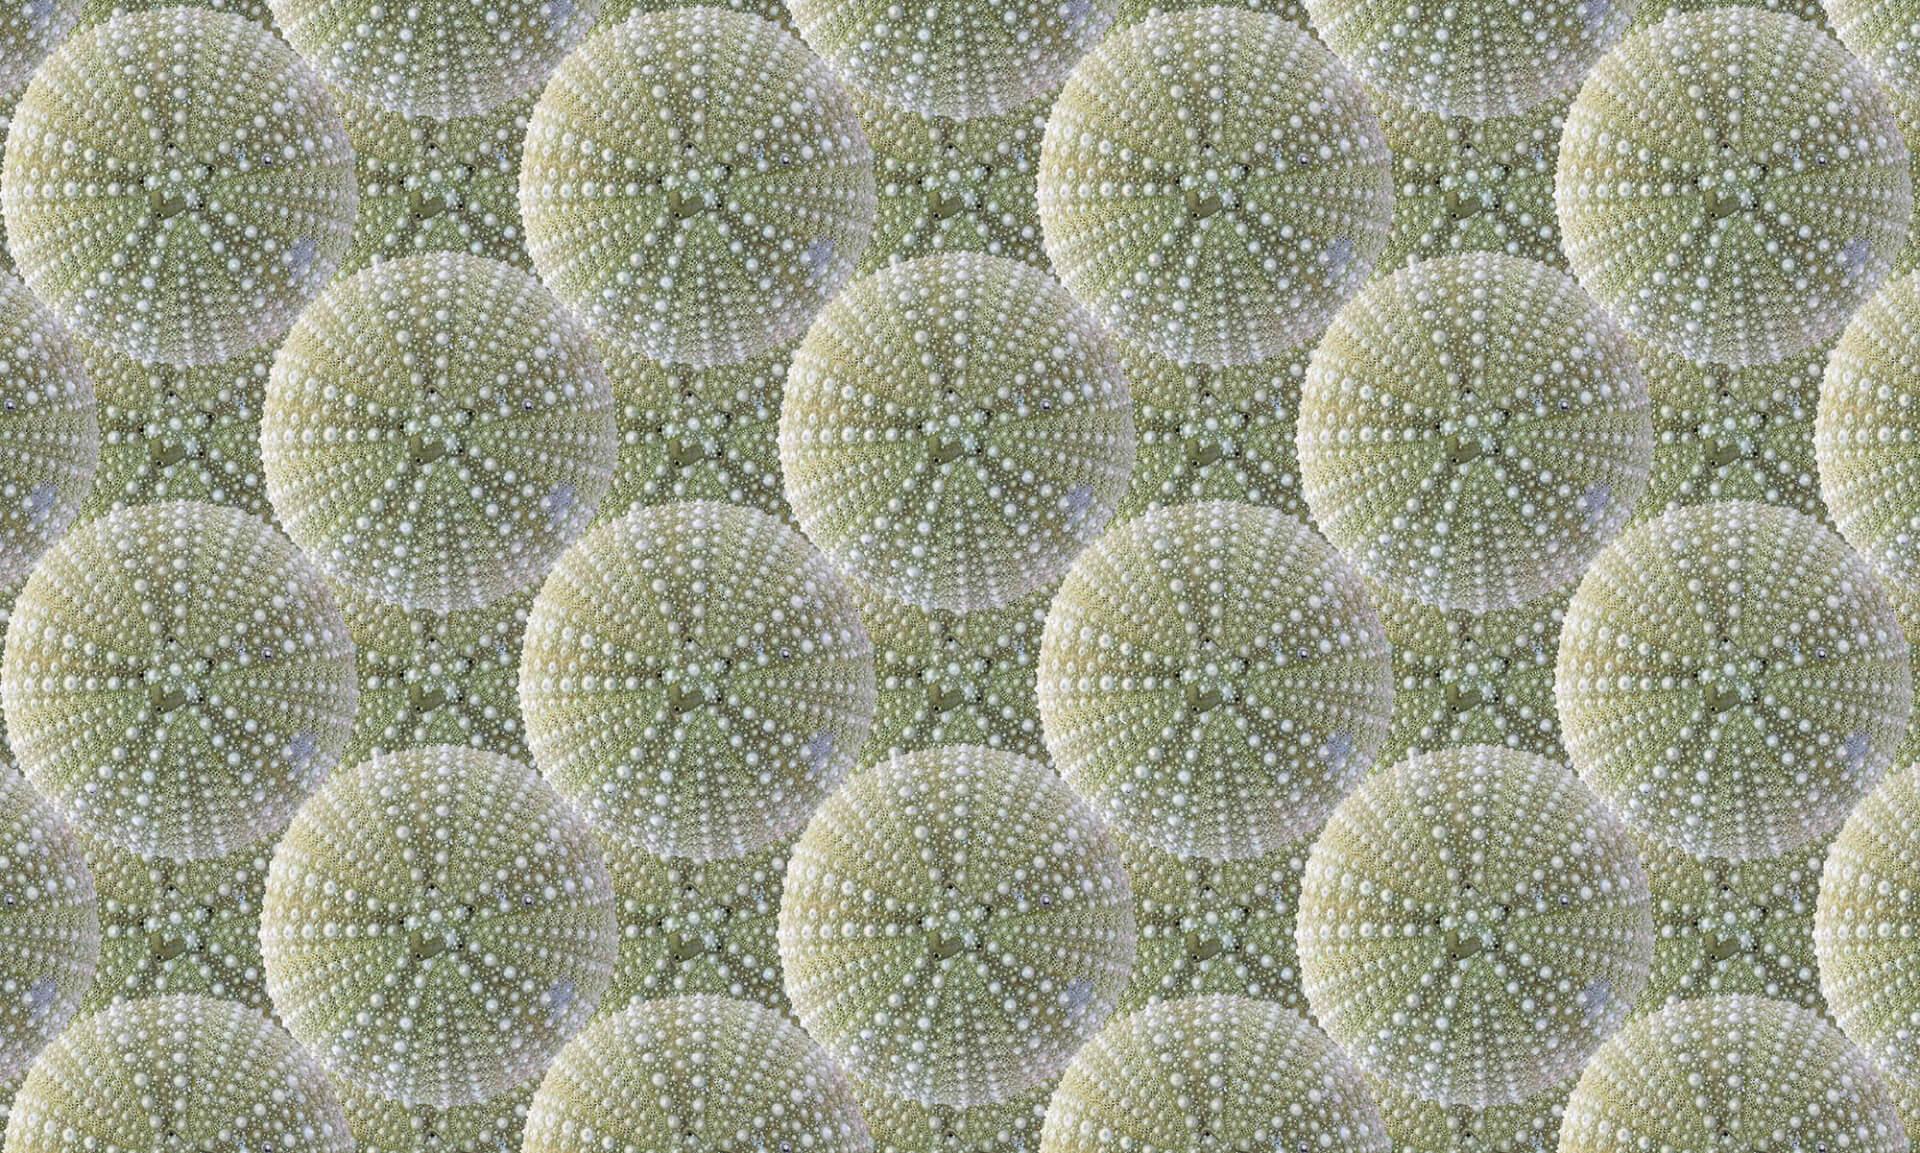 Sea Urchin-4 inch scales Doug Garrabrants